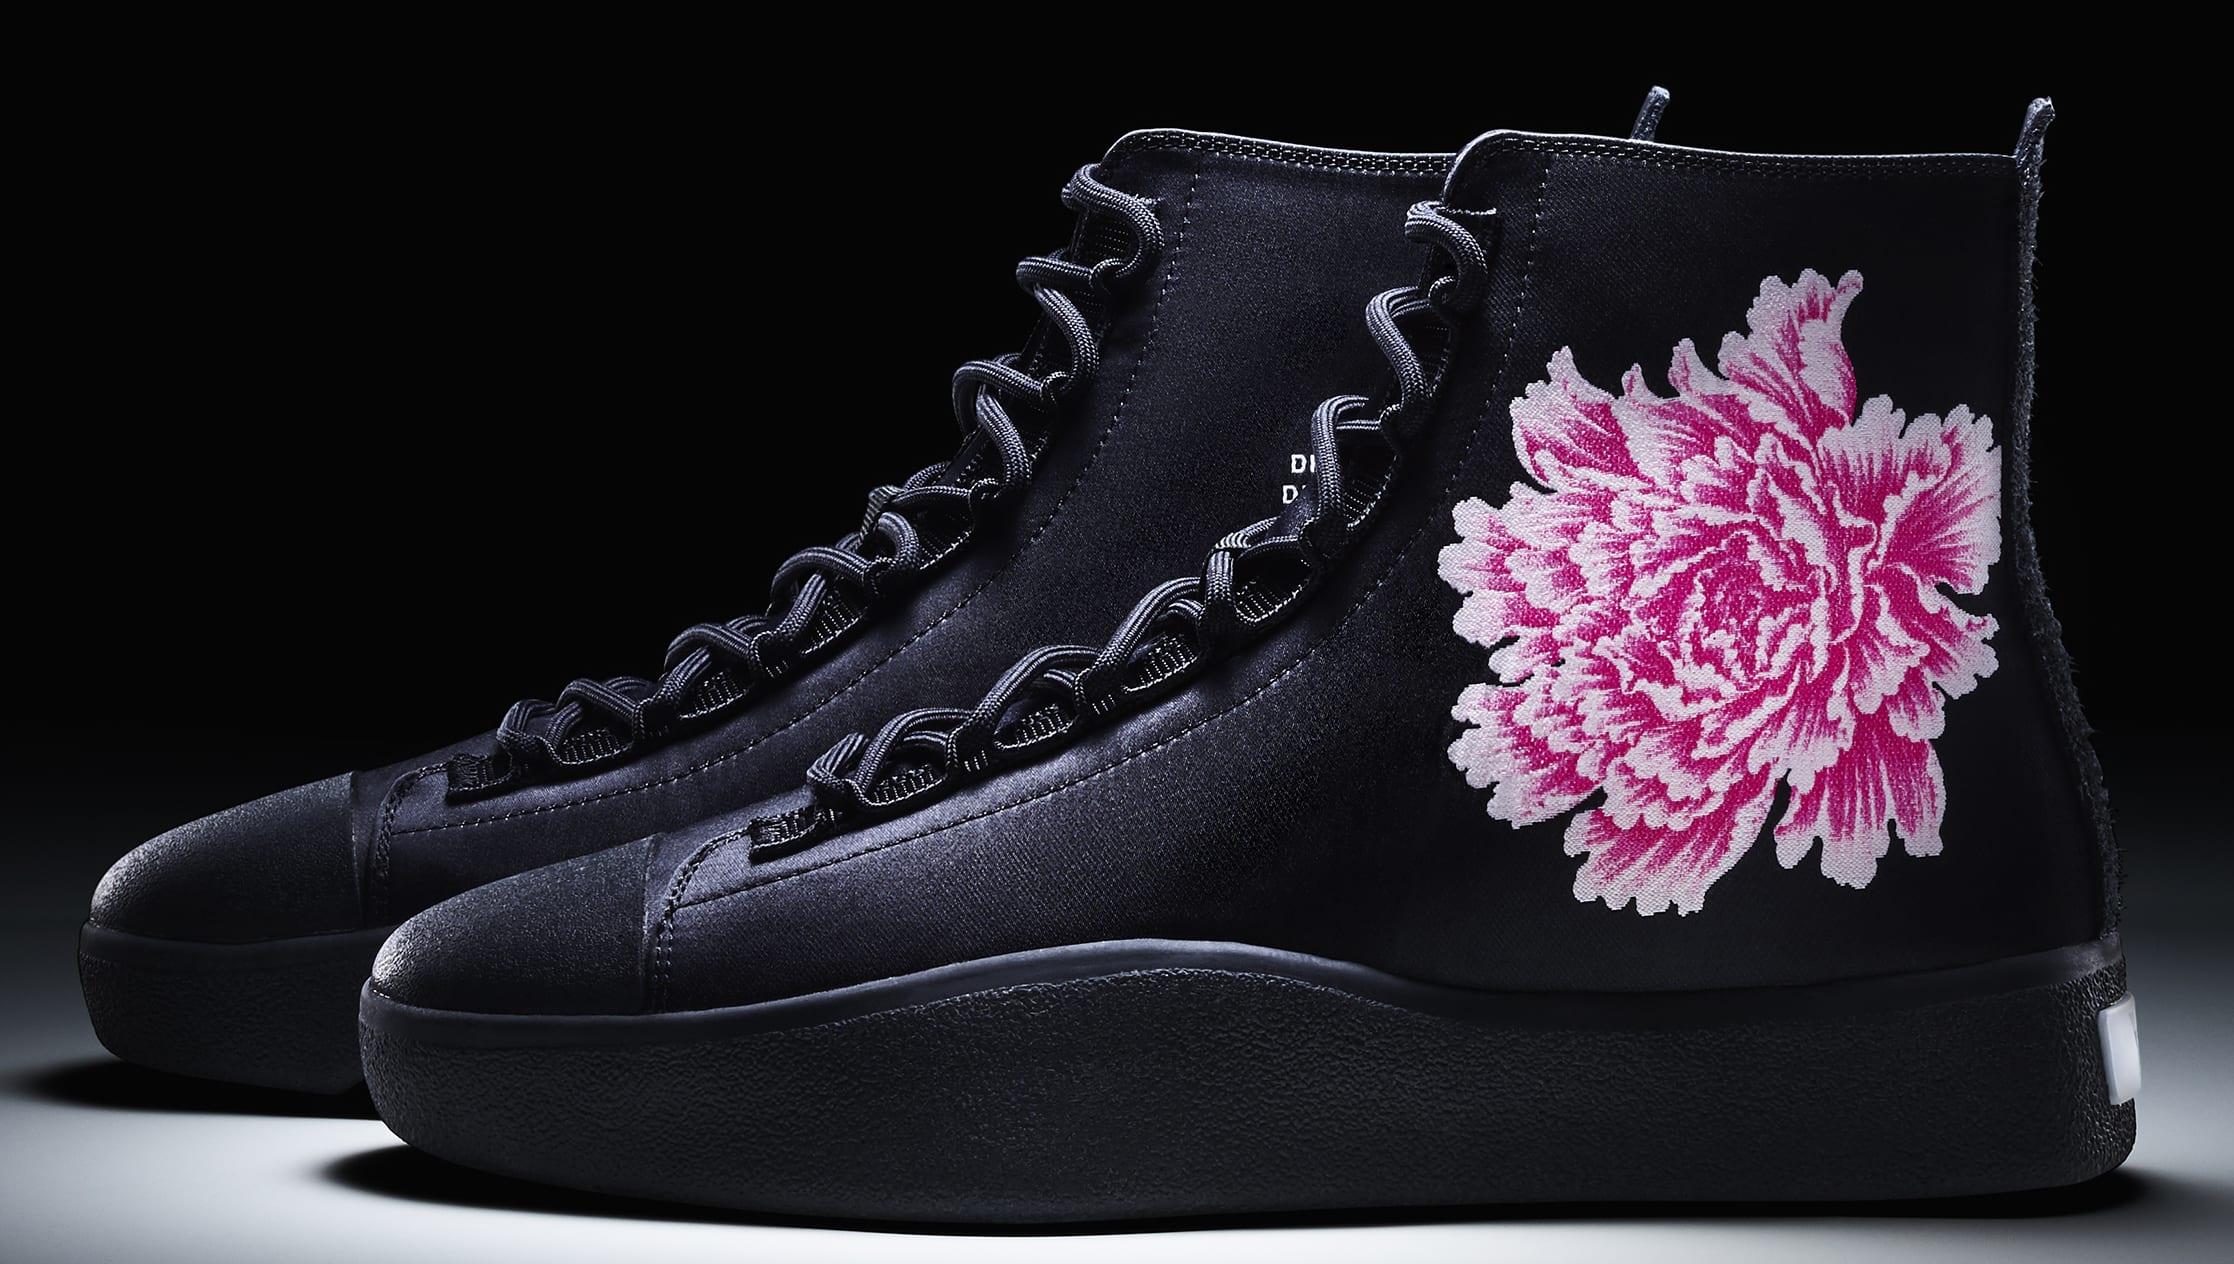 Y-3 James Harden Bashyo Sneakers Discount Amazing Price mmSKfG2y